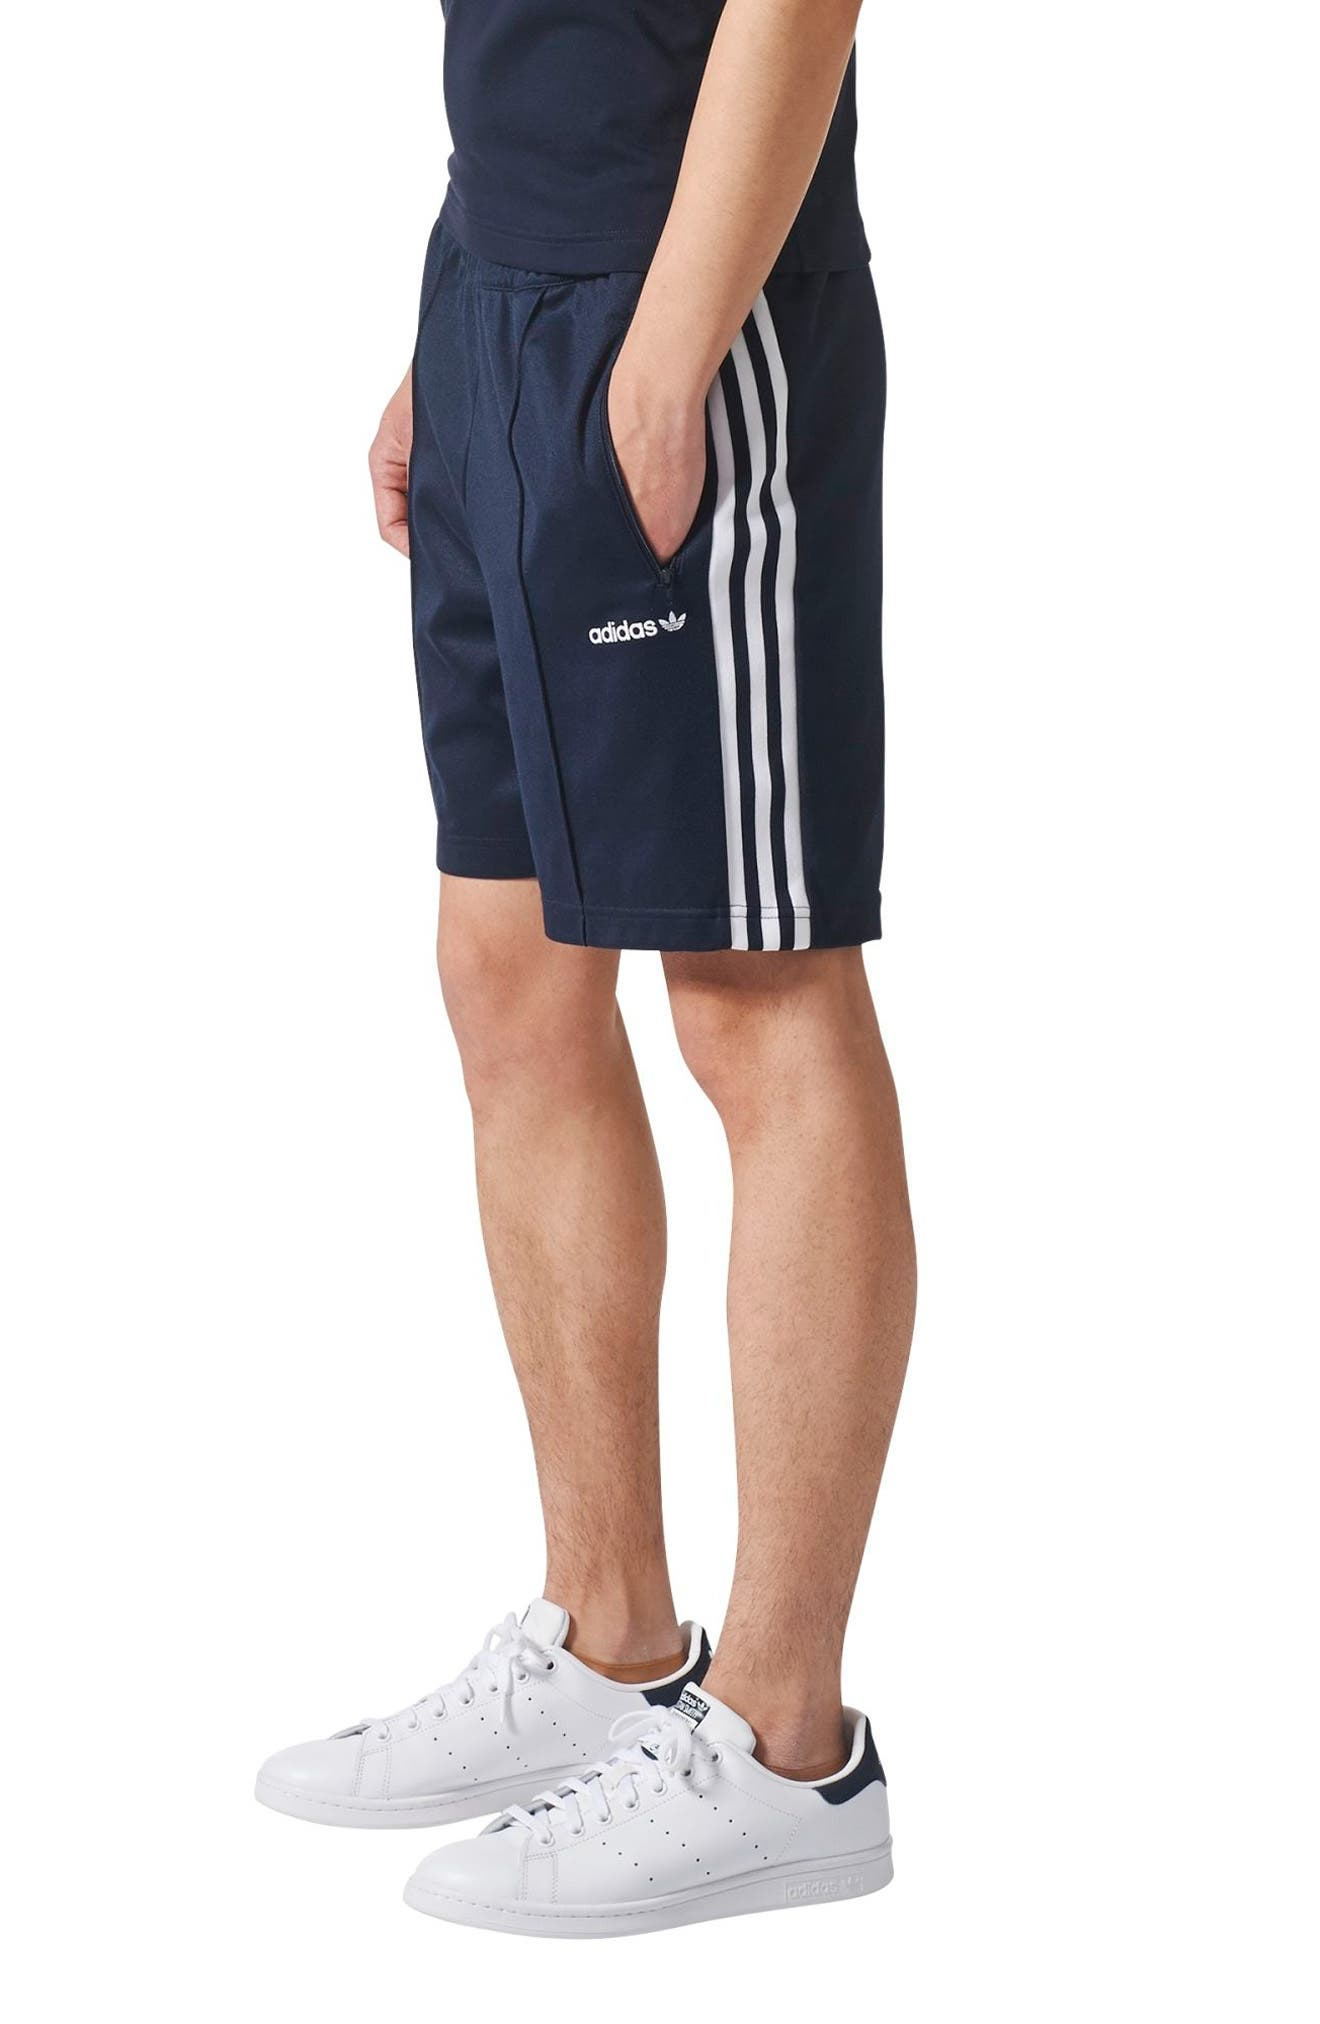 Beckenbauer Shorts,                             Alternate thumbnail 3, color,                             408